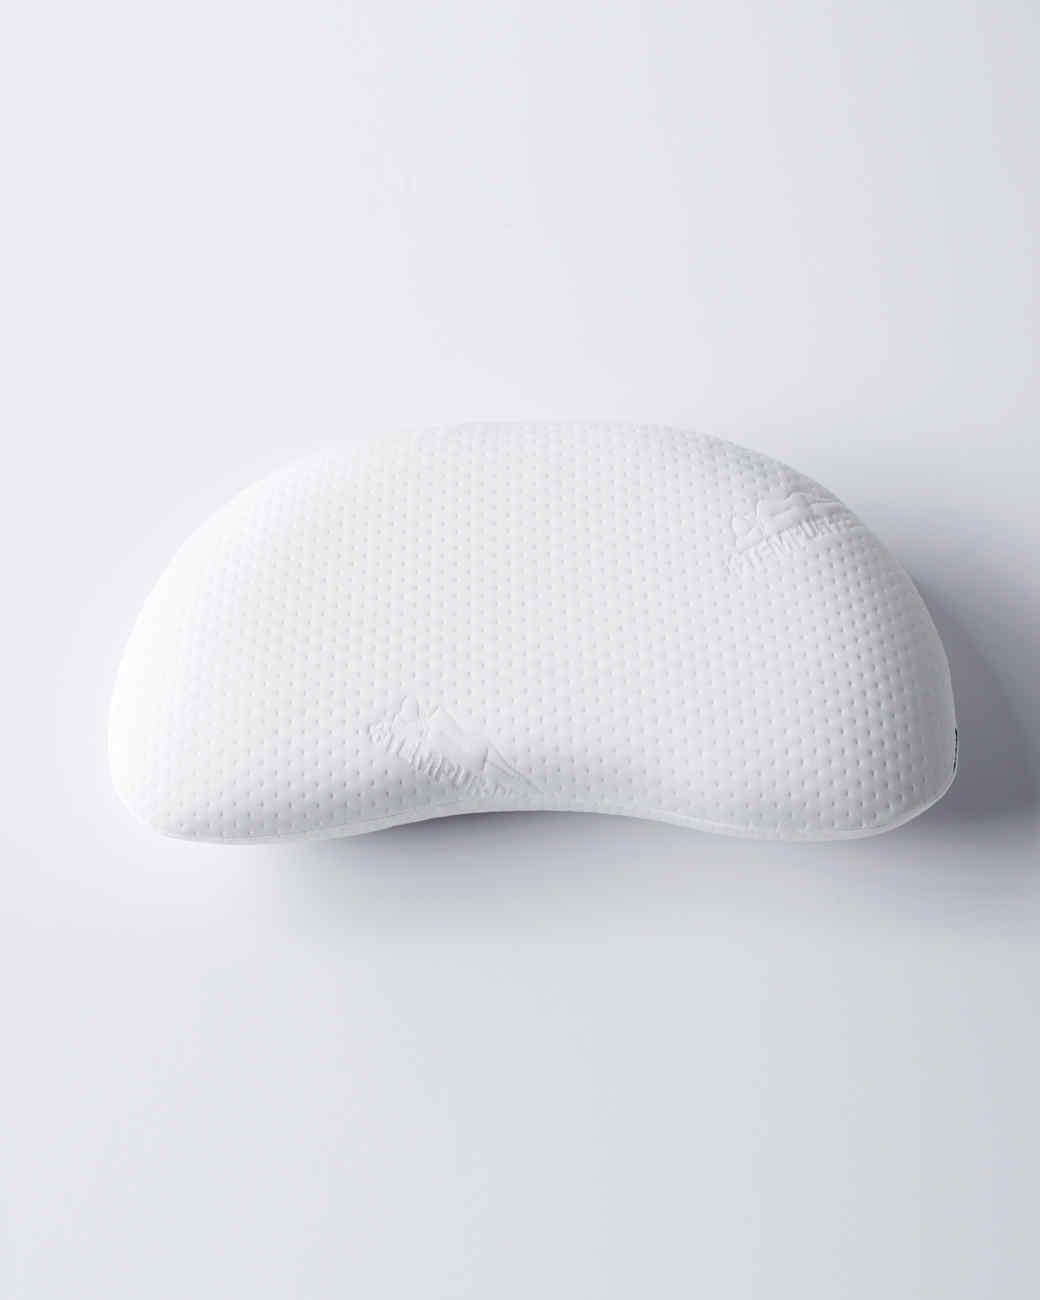 memory-foam-pillow-2-d111310-0914.jpg